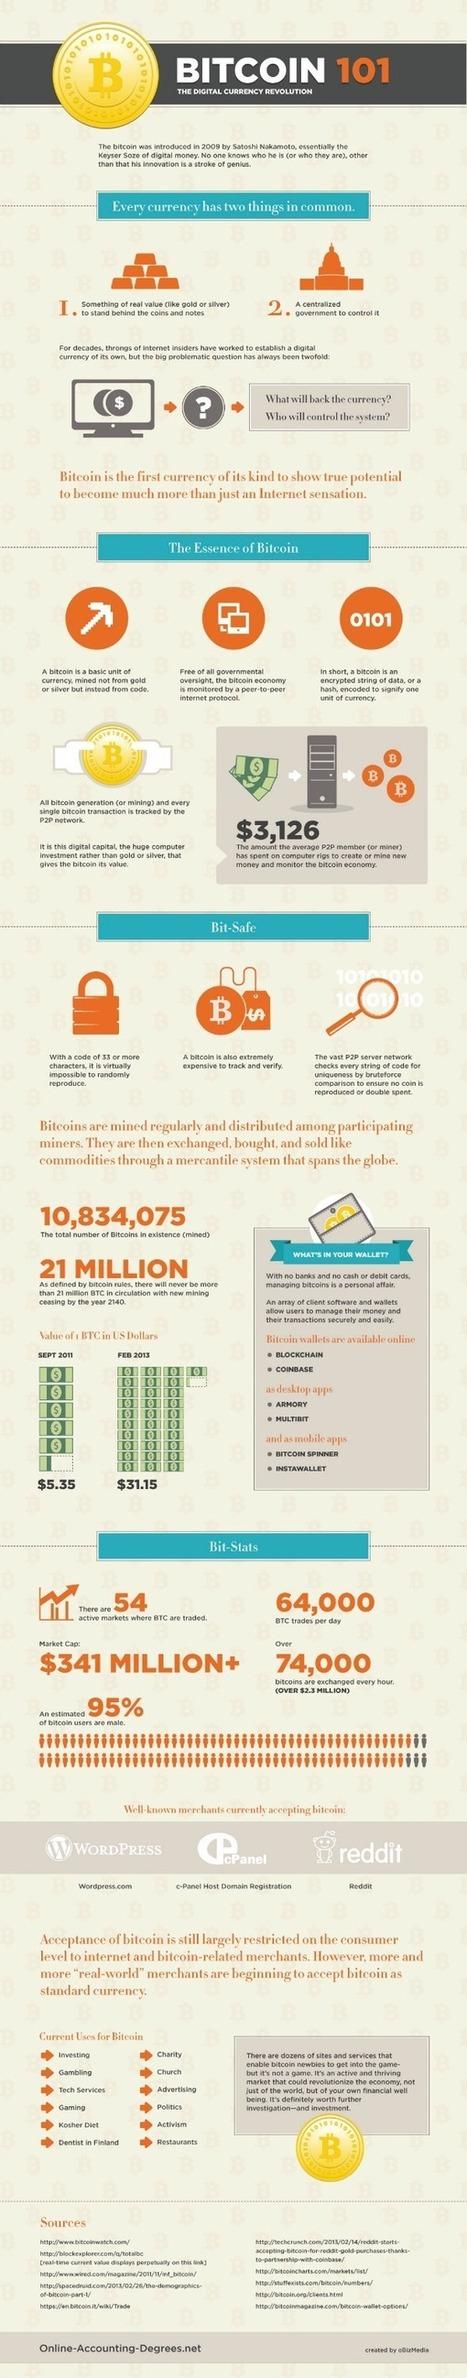 Bitcoin 101 [infographic]   The Best Infographics   Scoop.it